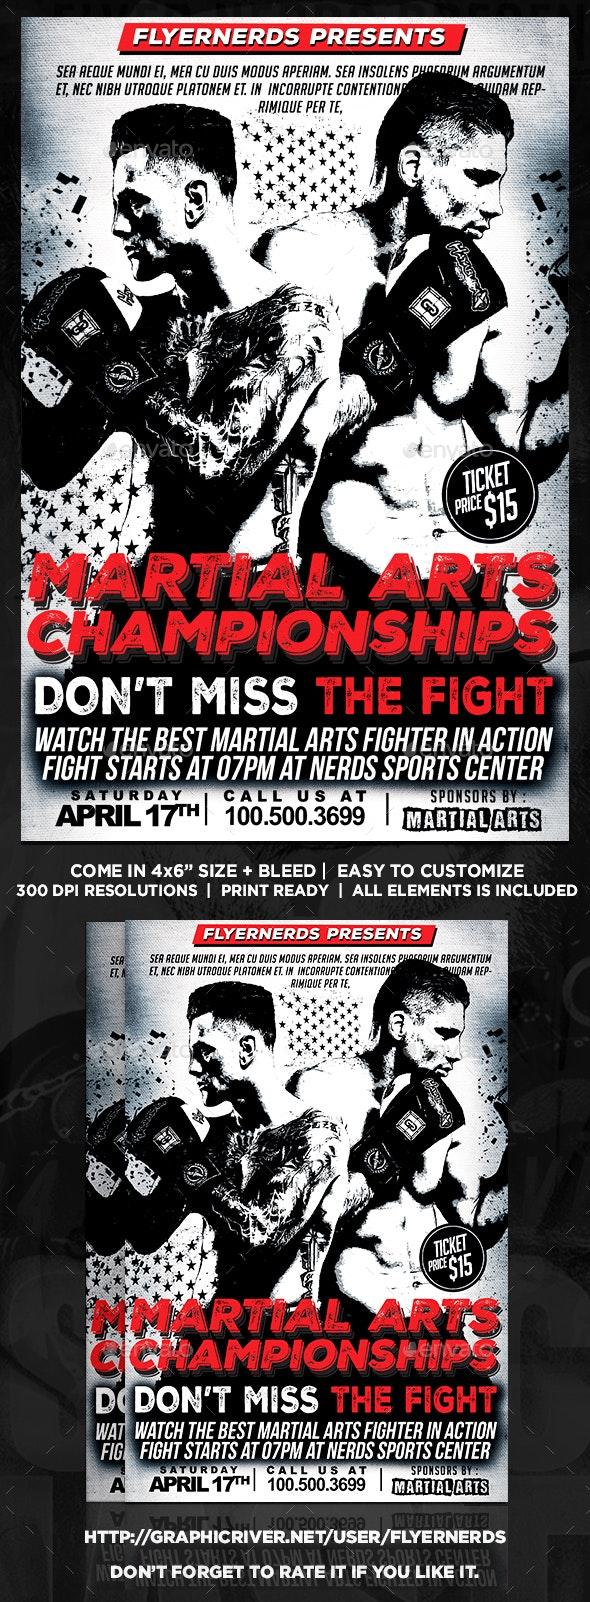 Martial Arts Championship Sports Flyer - Sports Events